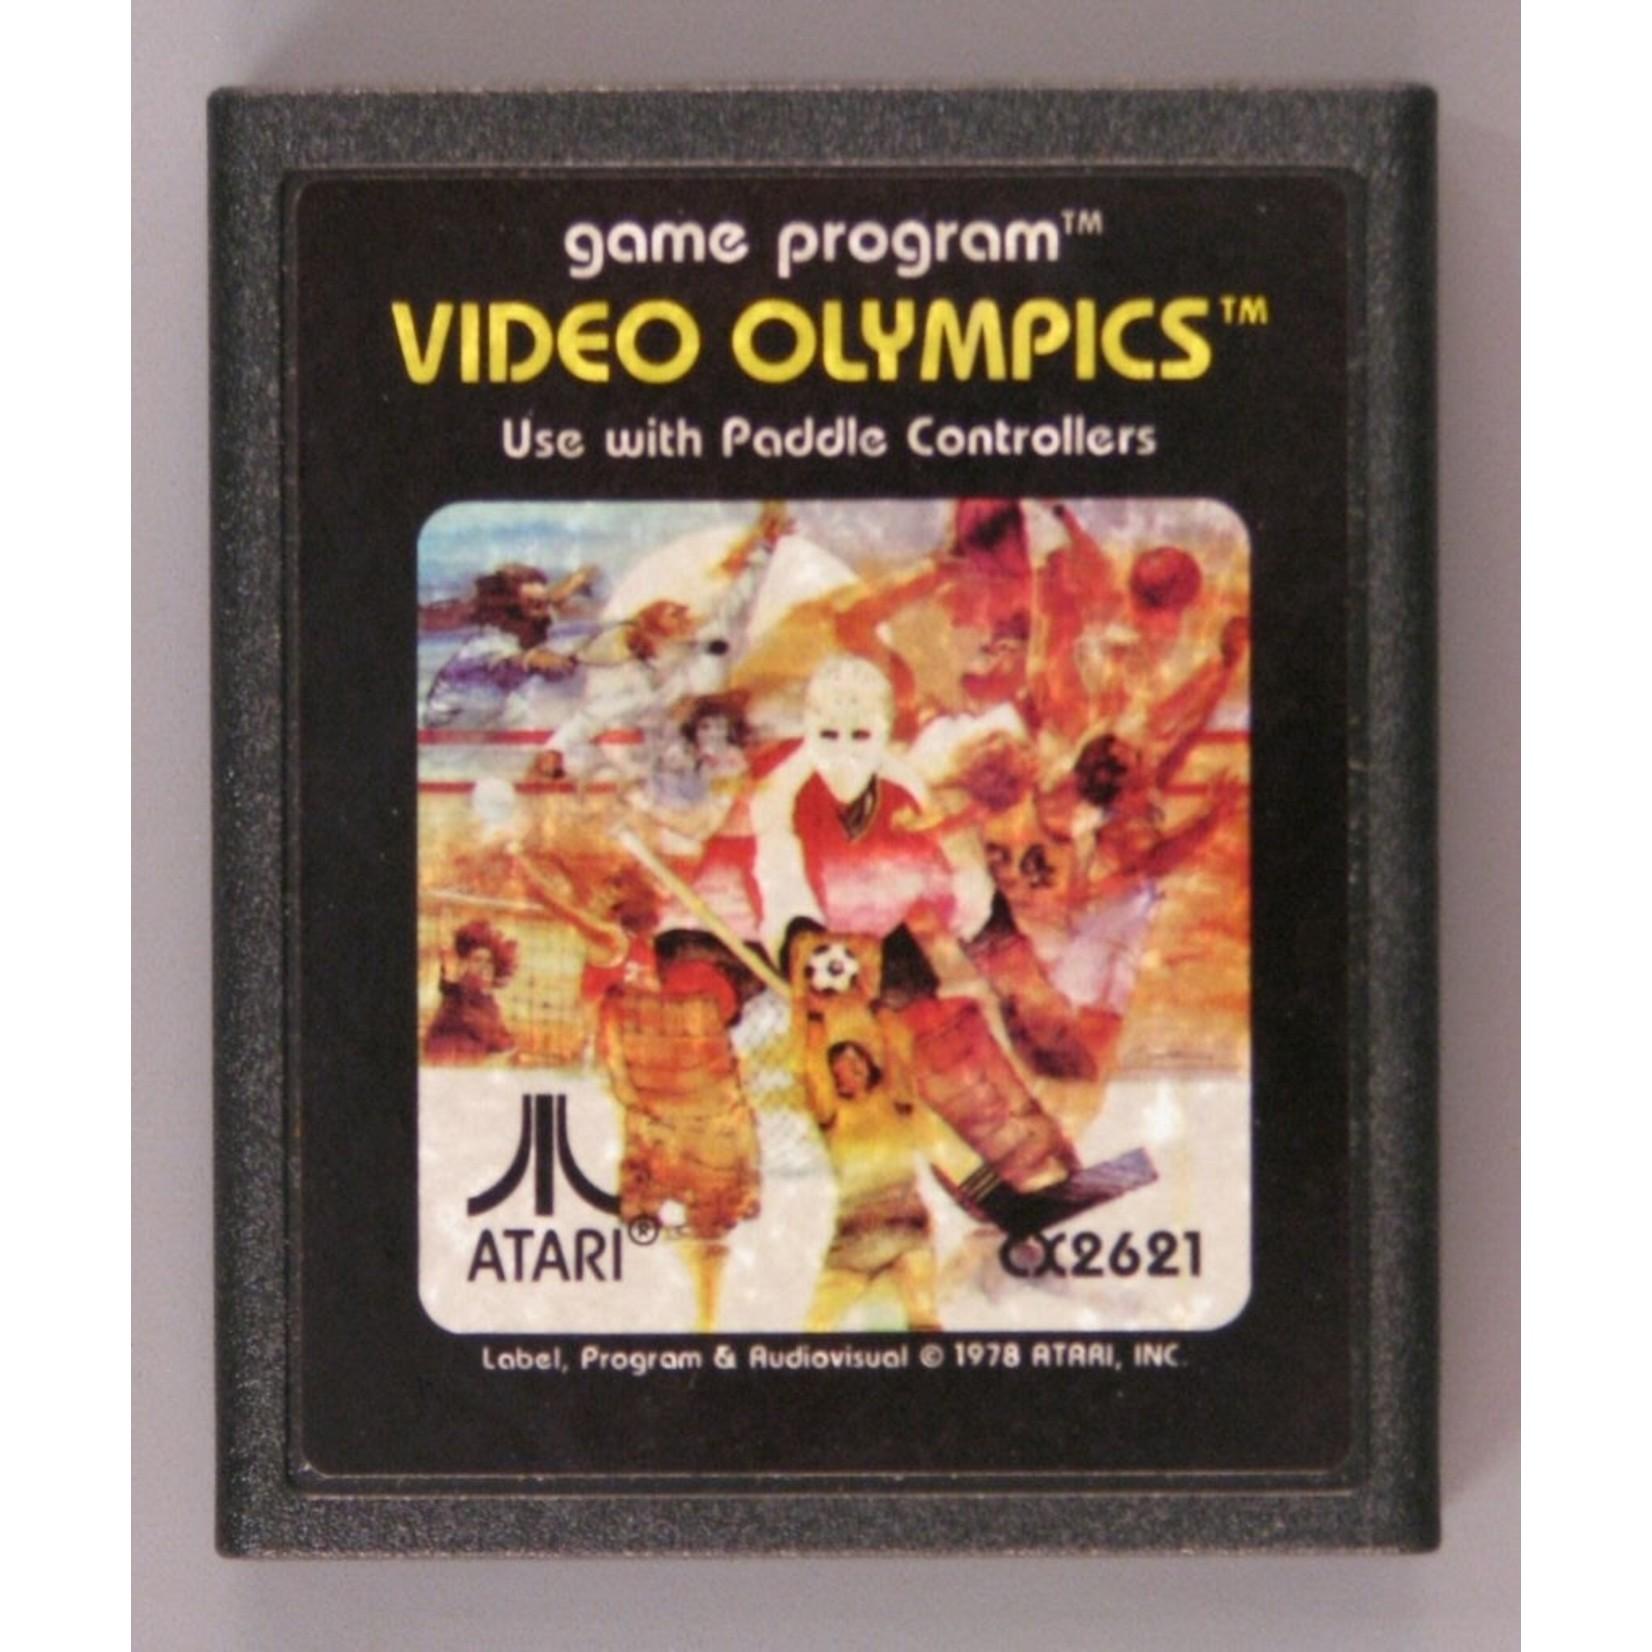 ATARIU-Video Olympics (CART ONLY)